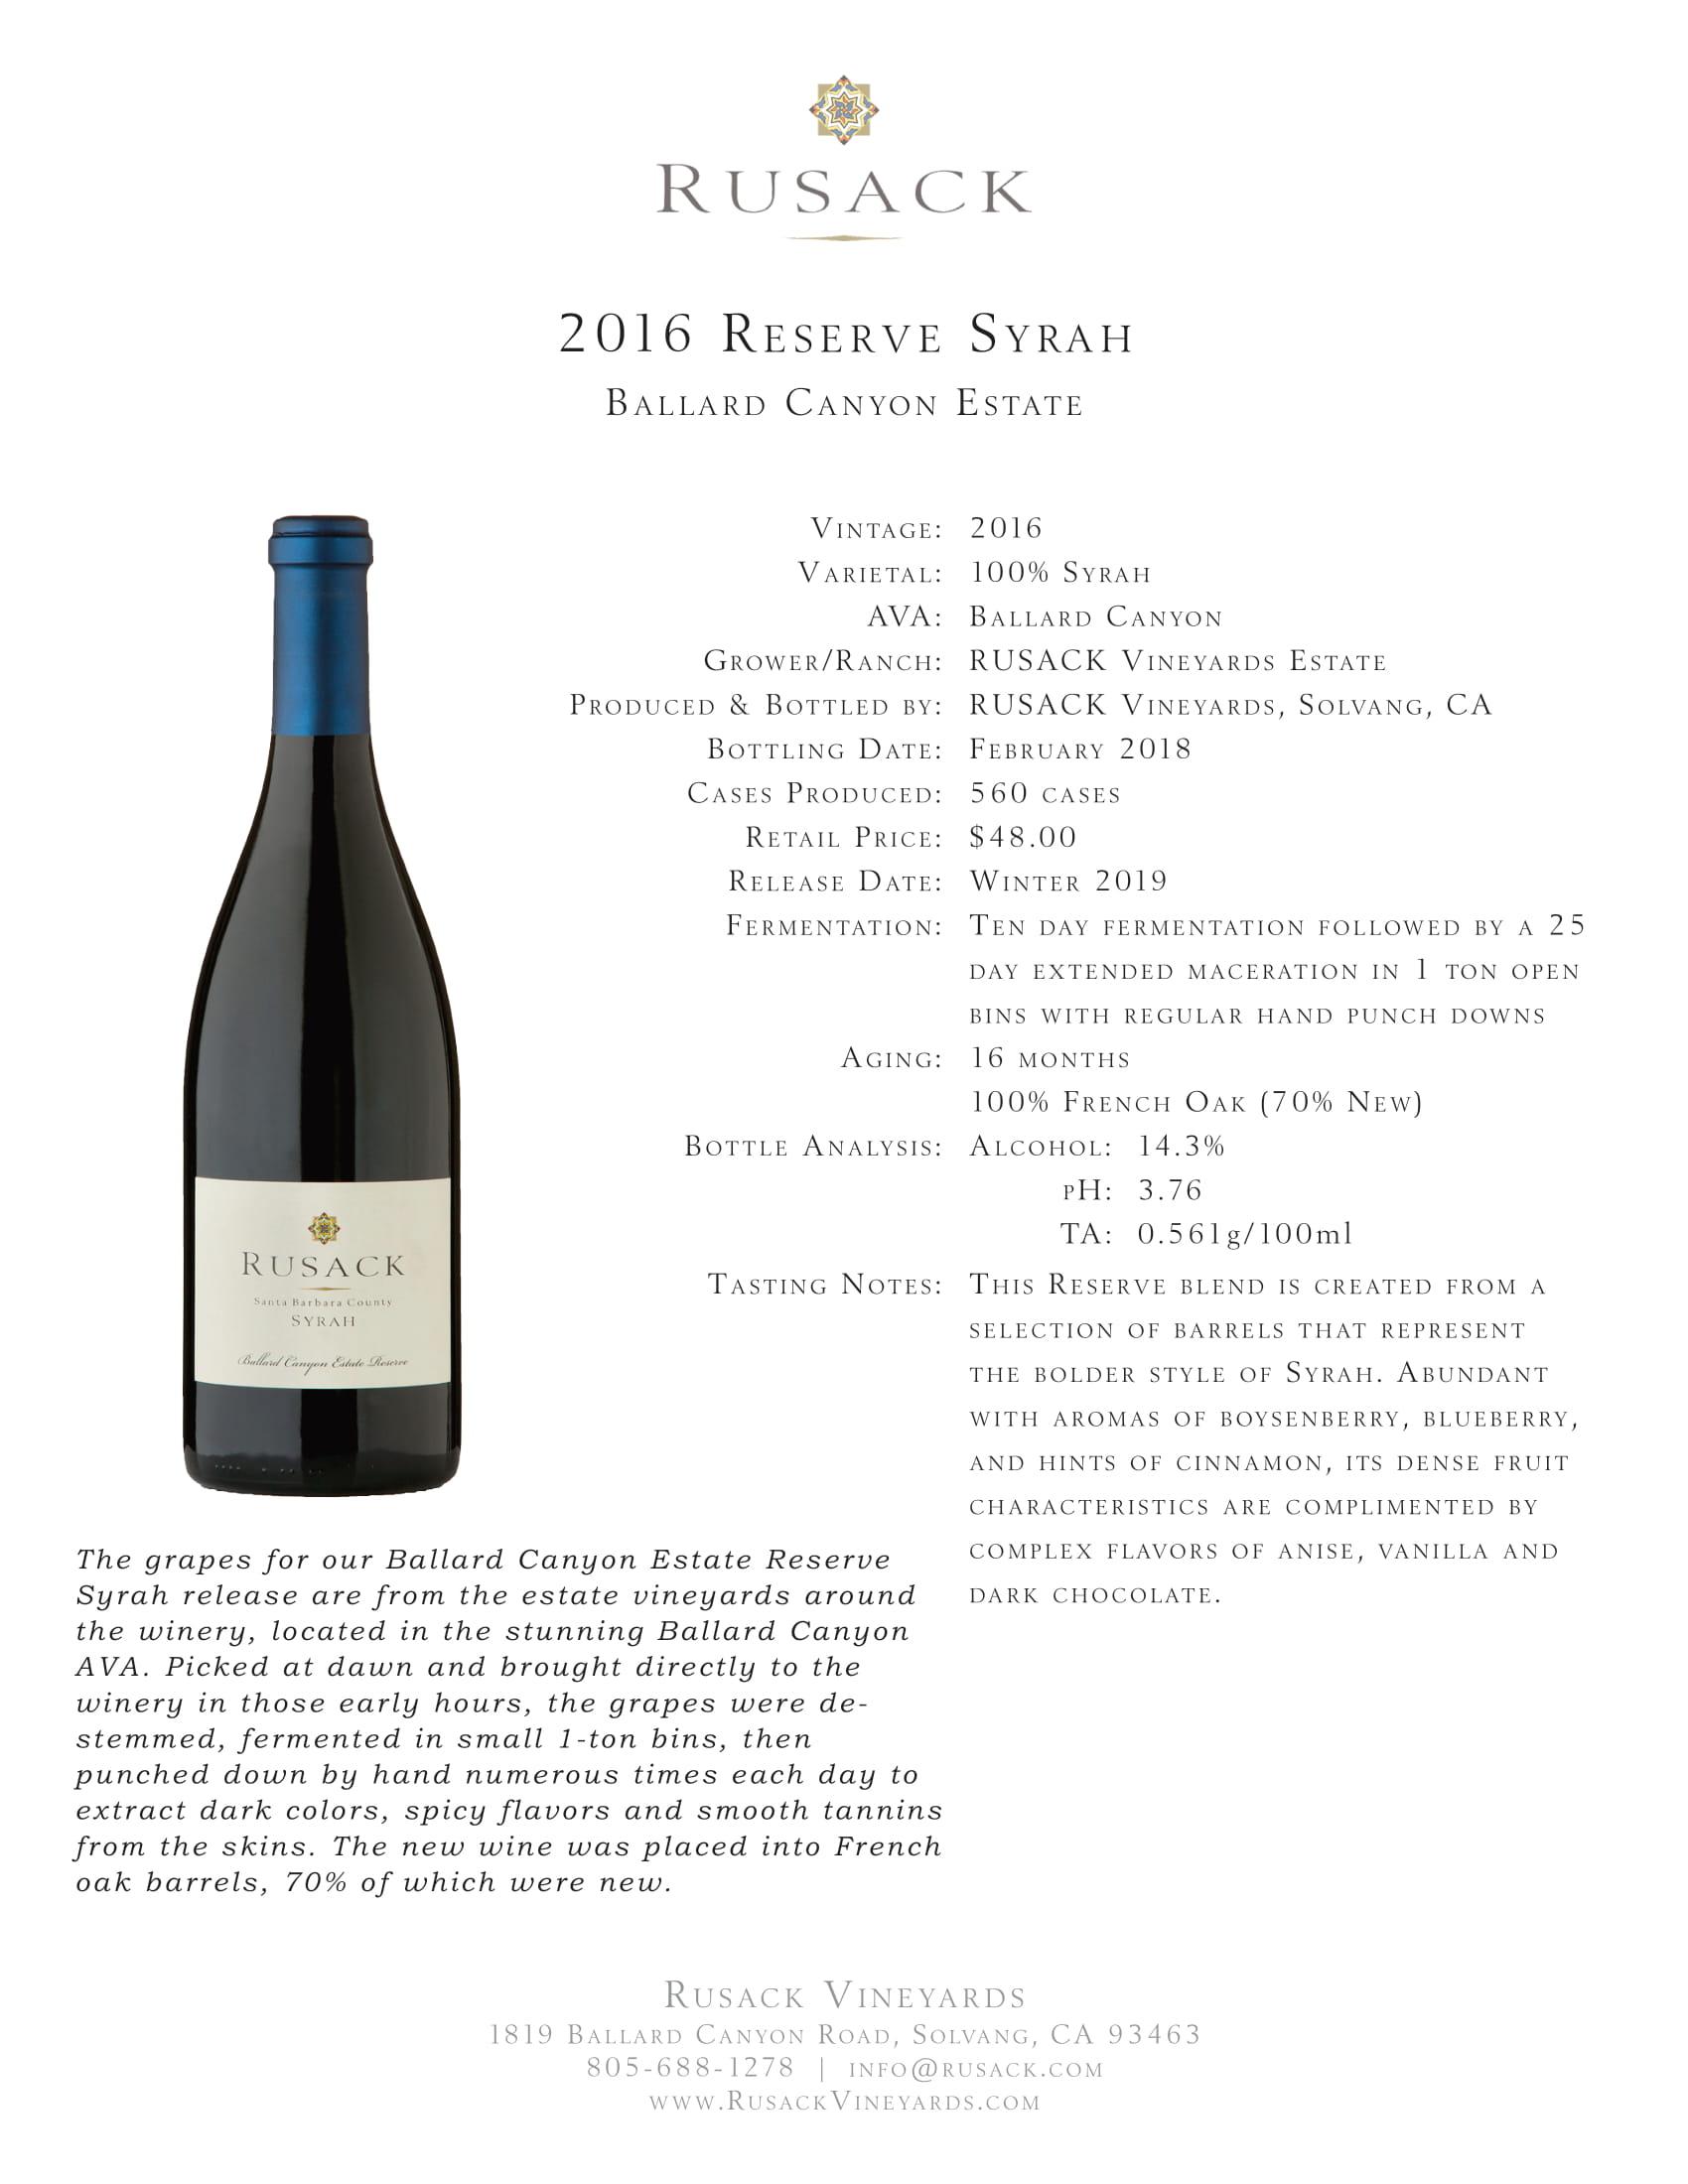 Ruscak Vineyards Syrah Ballard Canyon Estate Reserve Sell Sheet